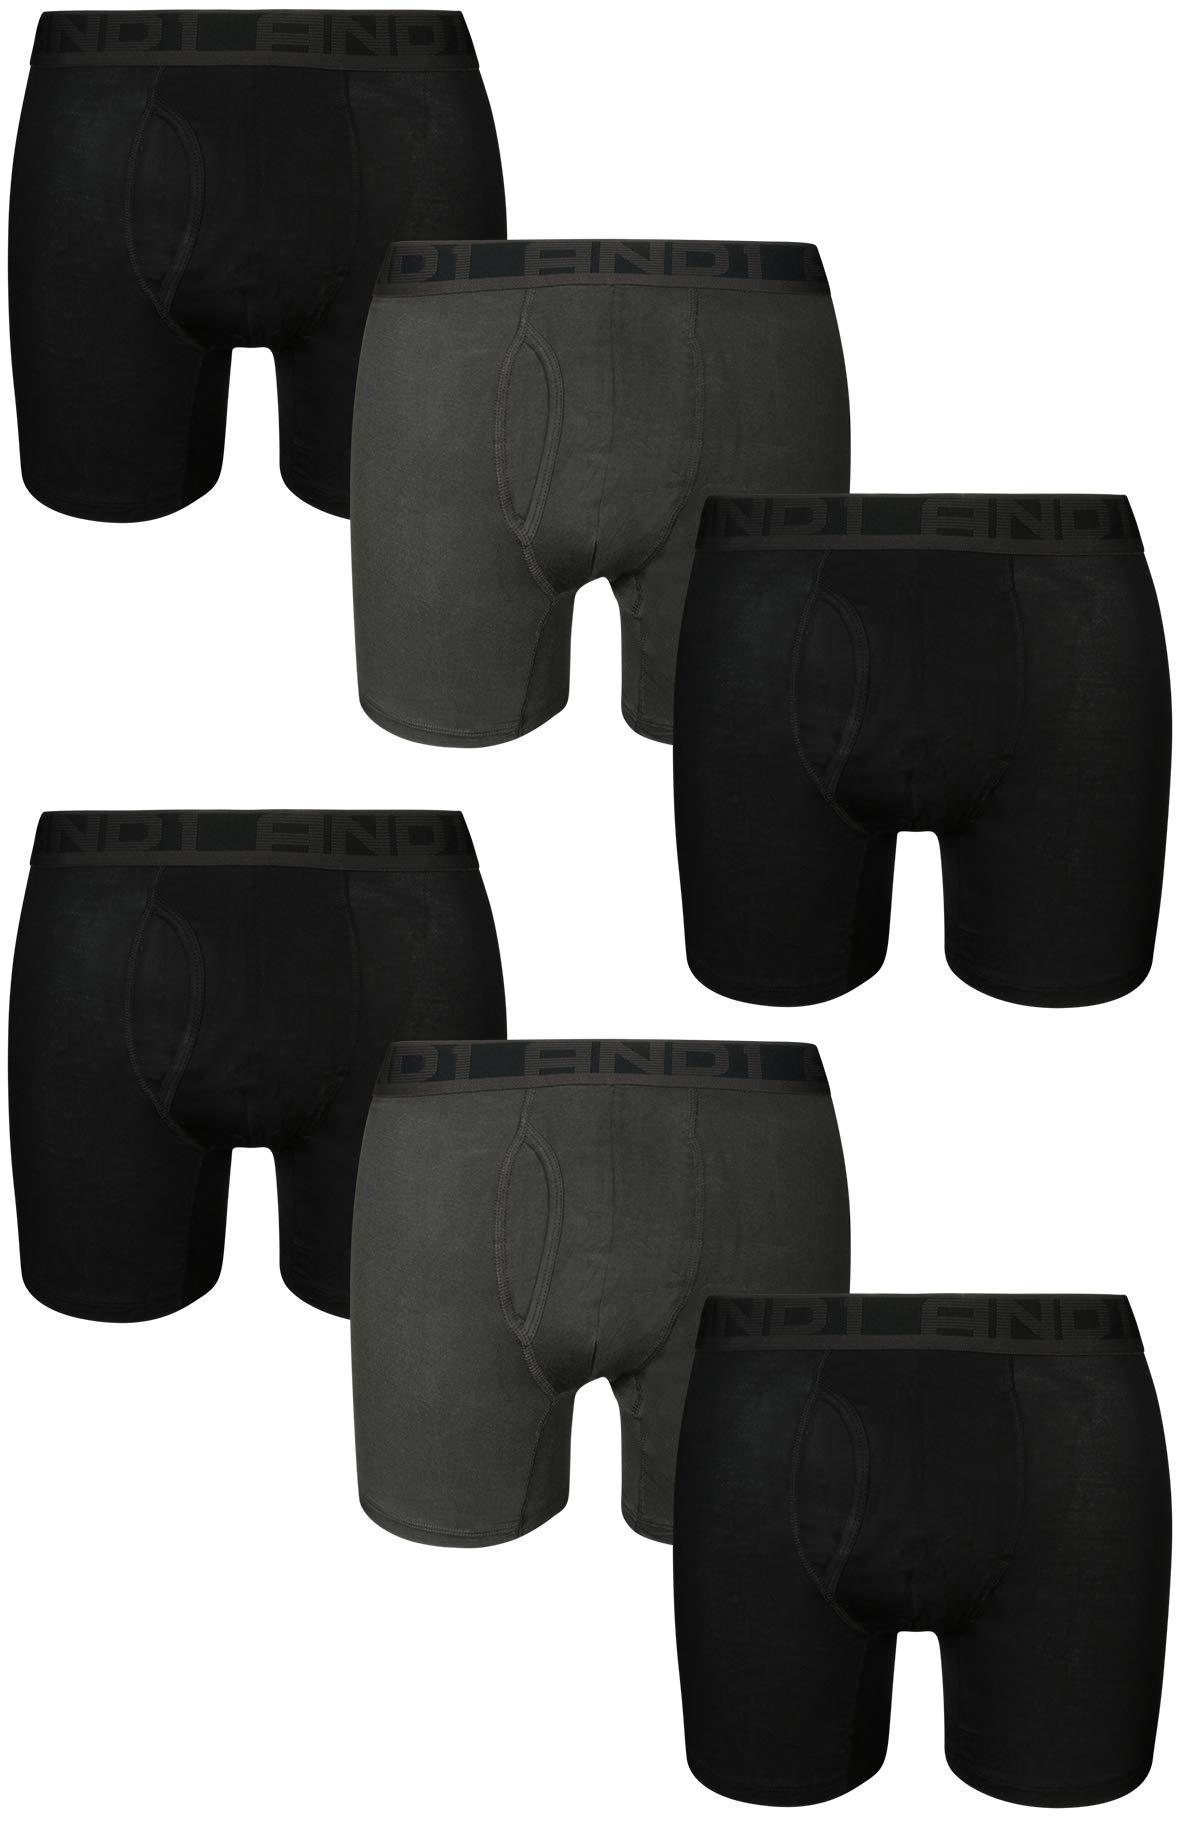 e3d4cdfe3ca6 AND1 Men's Ultra Soft Performance Boxer Briefs Underwear (6 Pack),  Black/Grey/Black, X-Large'